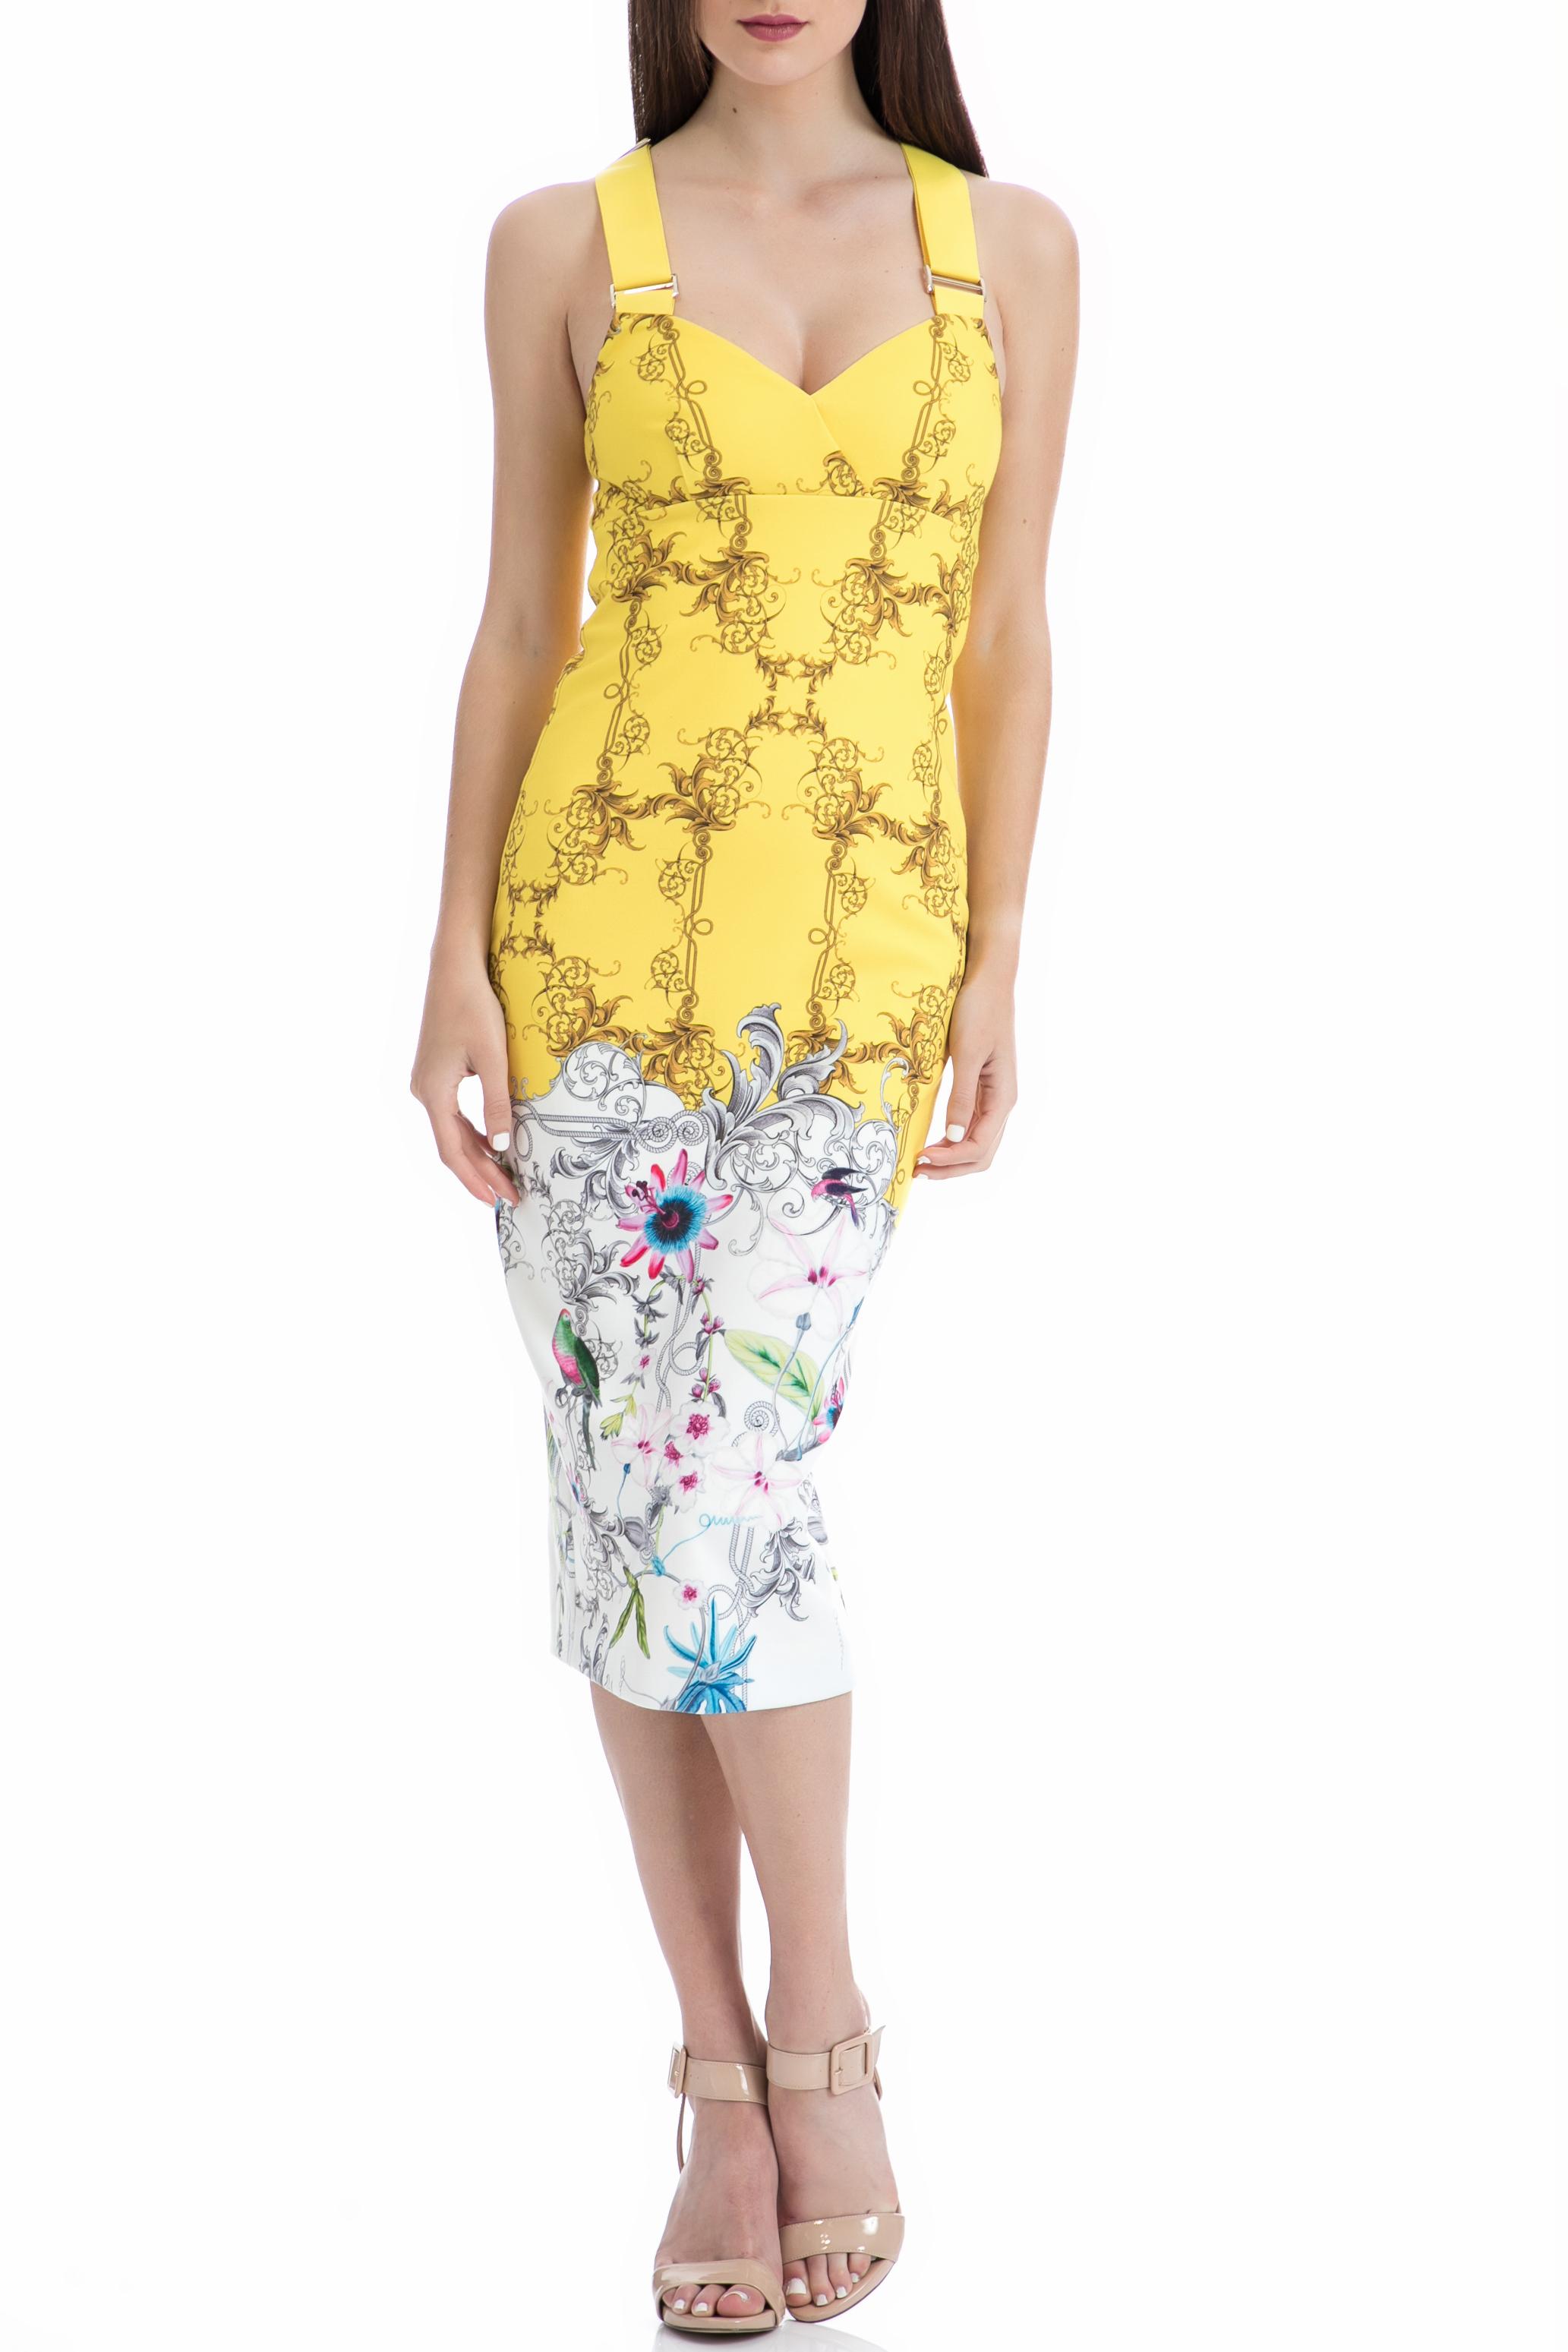 TED BAKER - Γυναικείο φόρεμα Ted Baker κίτρινο-λευκό